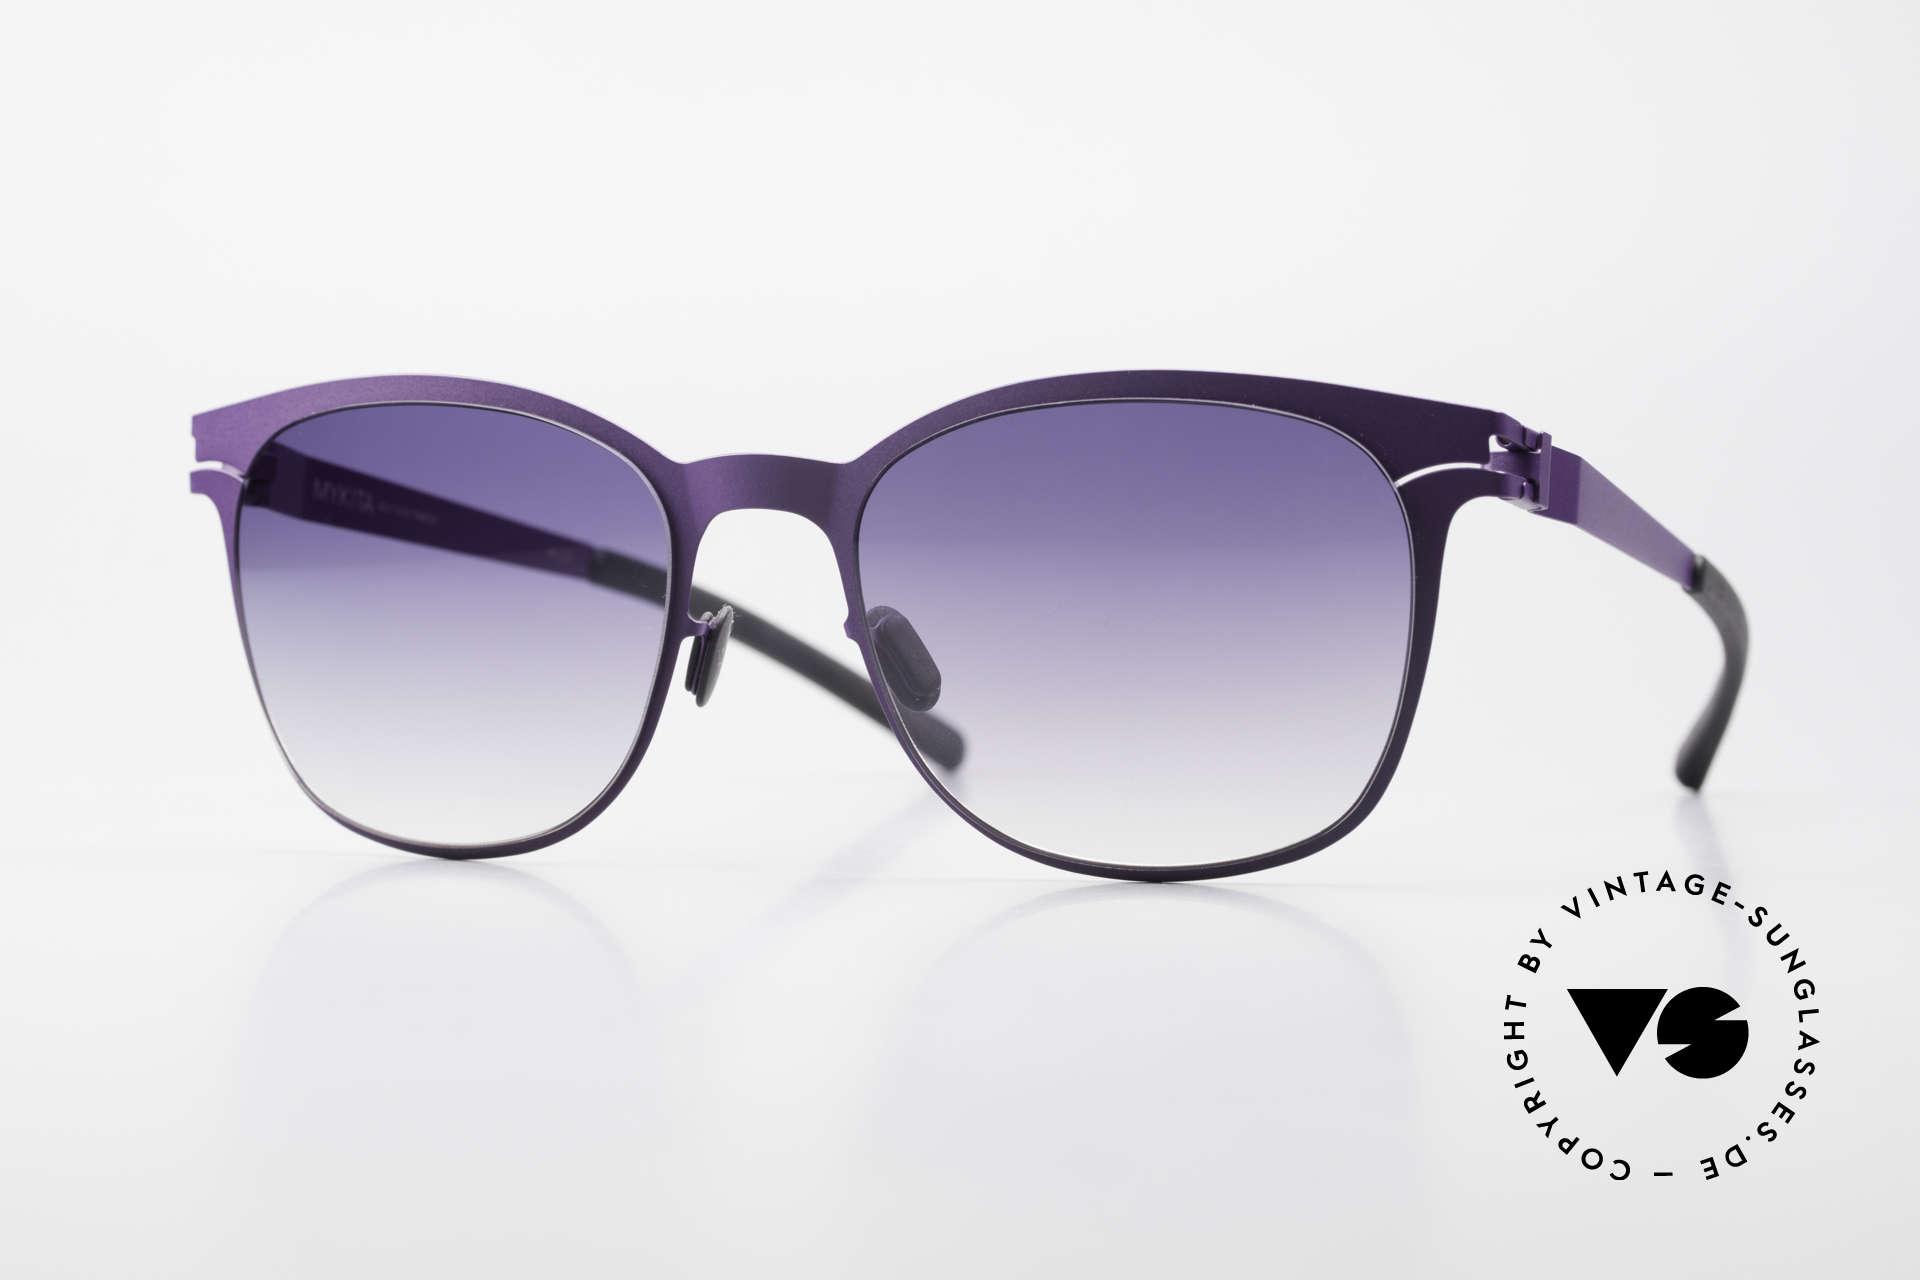 Mykita Greta Ladies Designer Sunglasses, original VINTAGE MYKITA ladies sunglasses from 2009, Made for Women